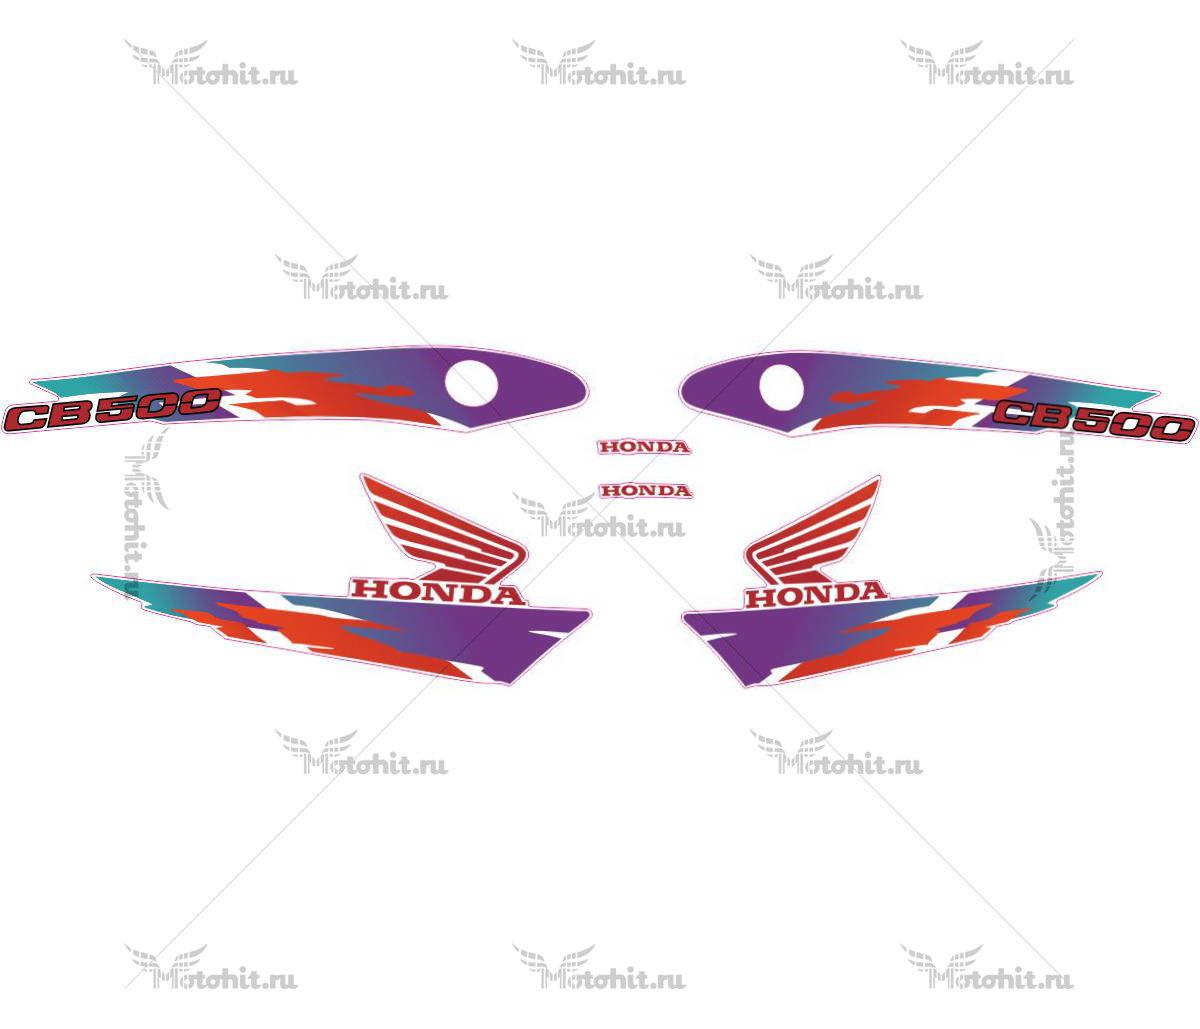 Комплект наклеек Honda CB-500 1998 violet